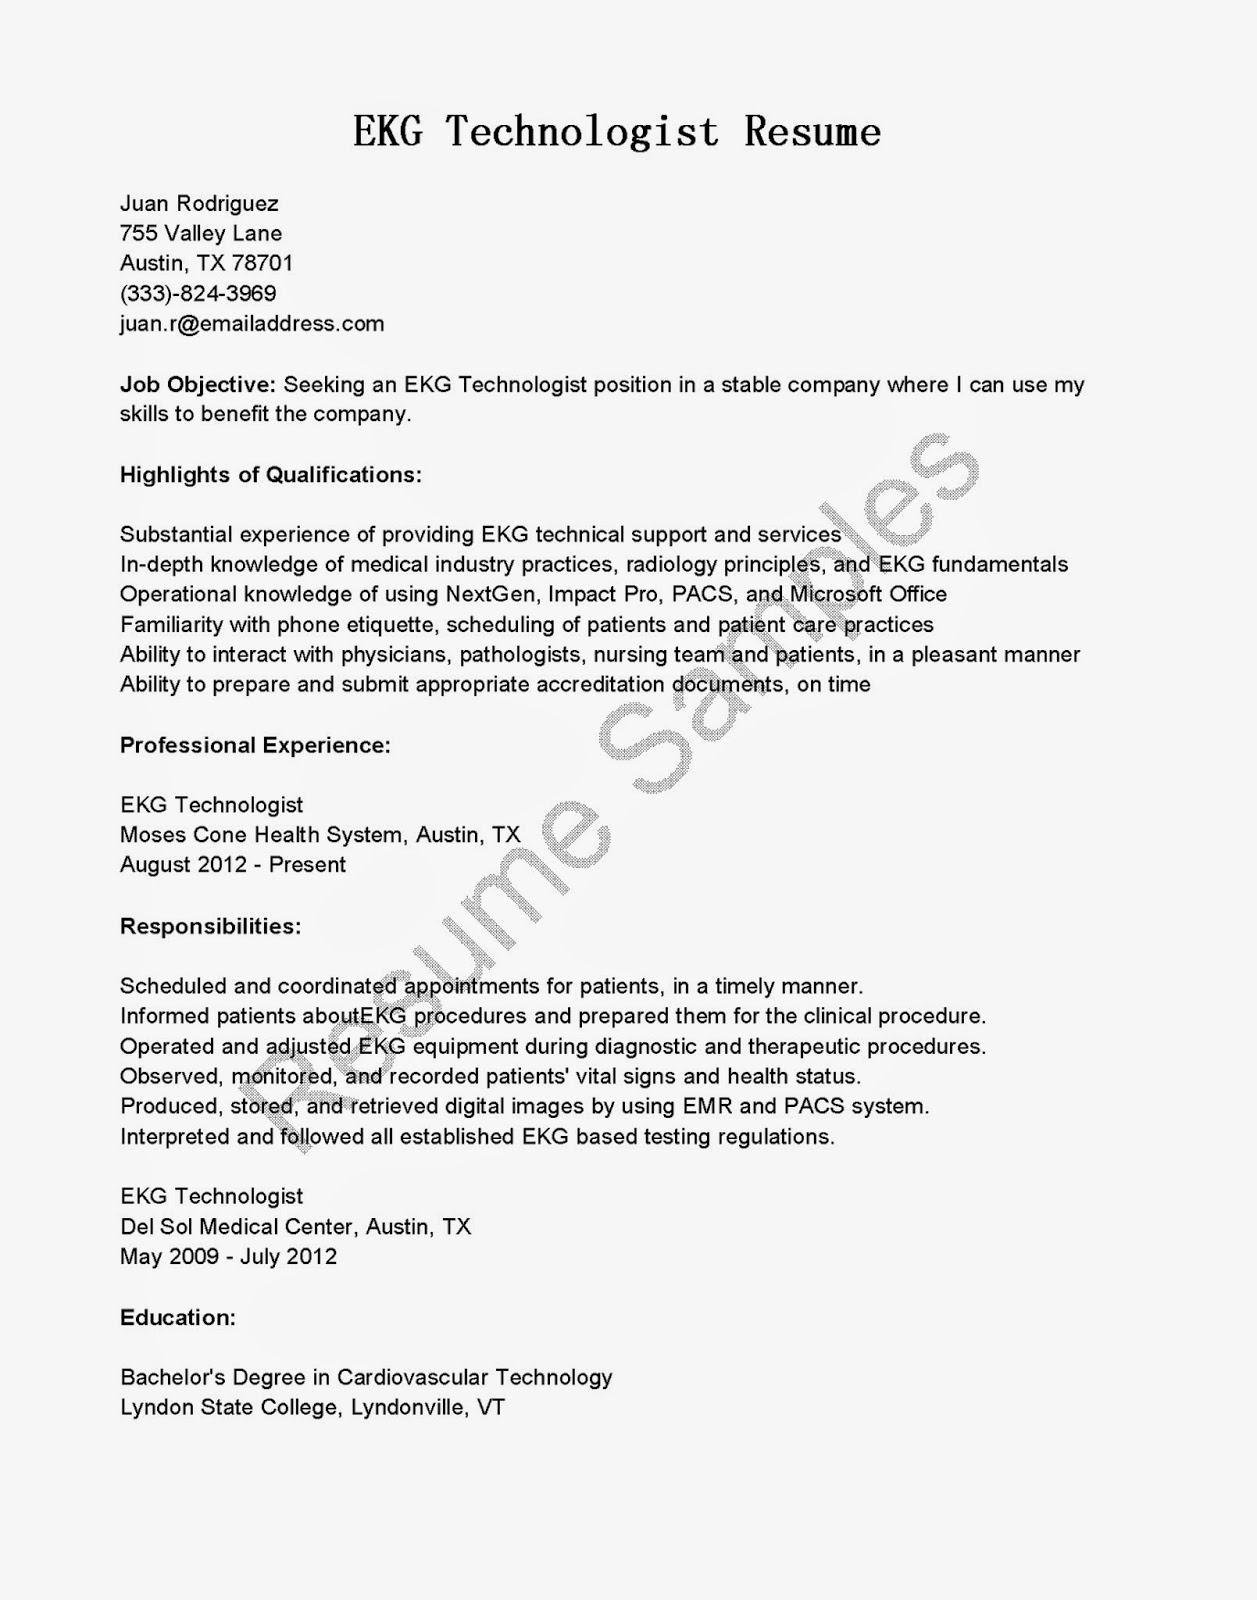 ekg resume samples